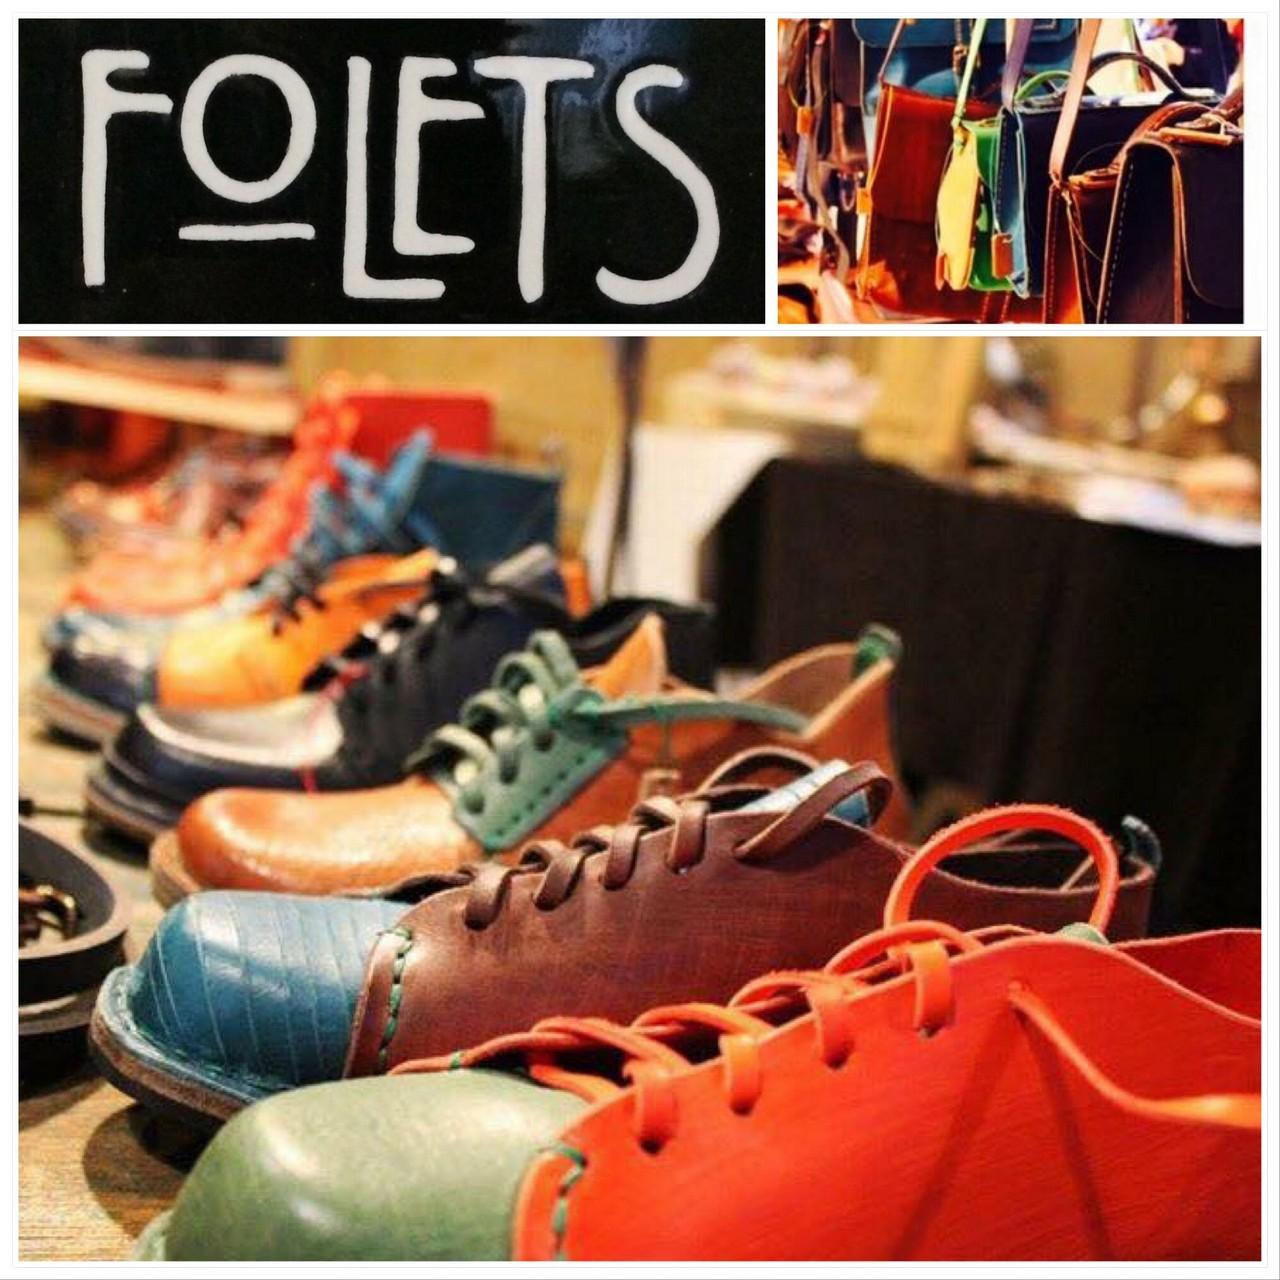 FOLETS Arte e Cuoio / Manufatturieri / Matrioska Labstore #14 / Rimini 7-8-9 dicembre 2018